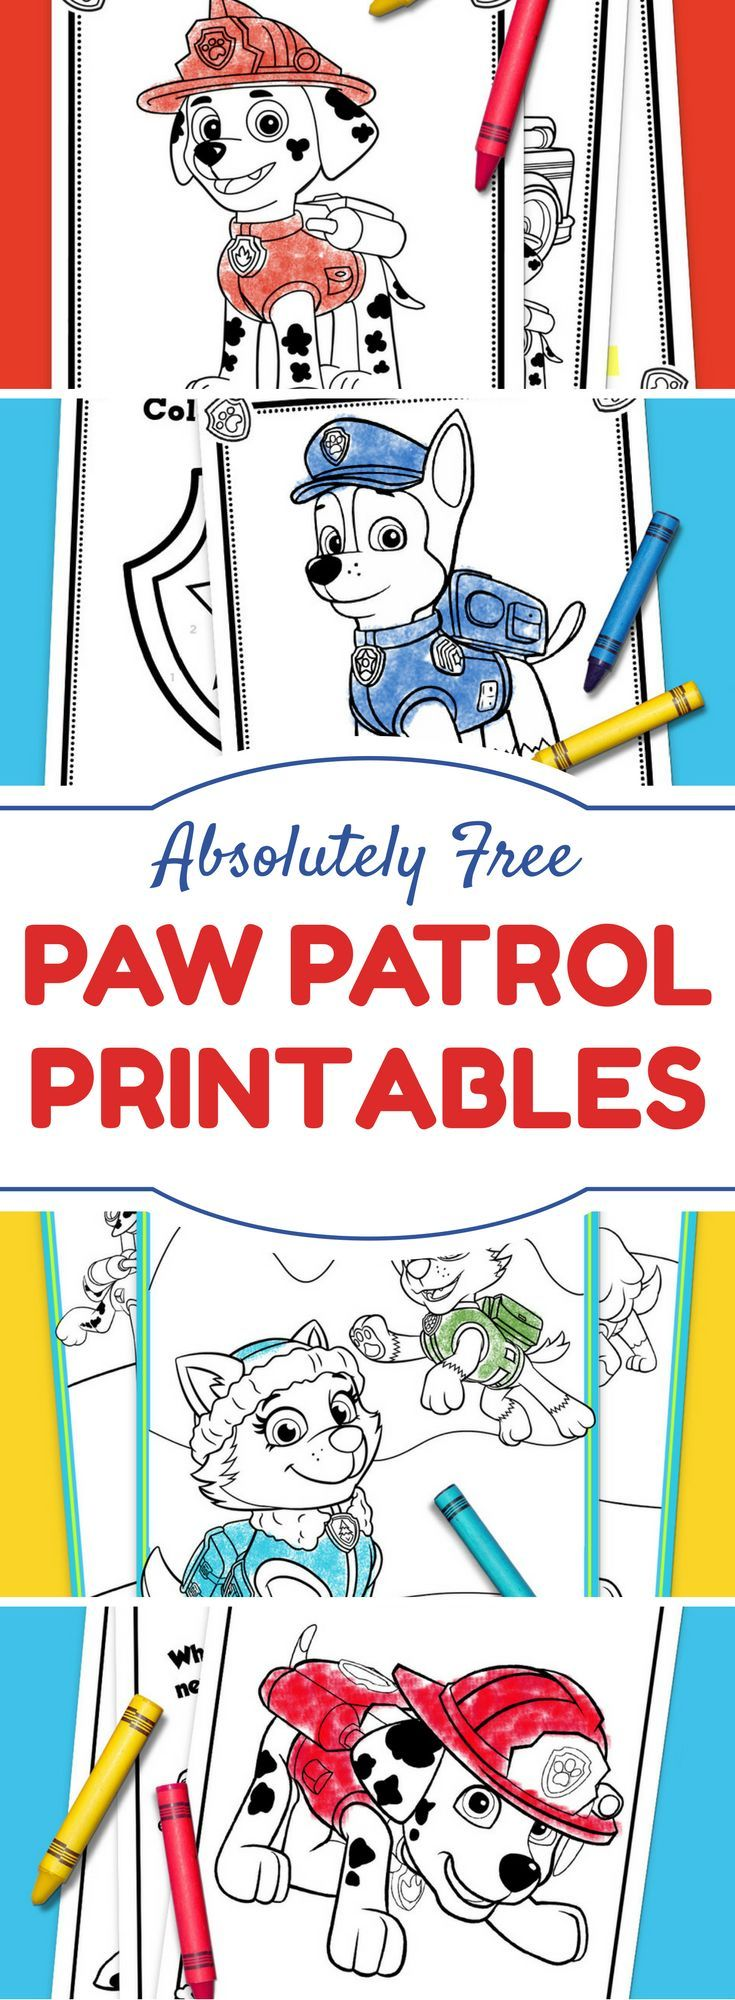 The Top 10 PAW Patrol Printables of All Time   Fiestas infantiles ...